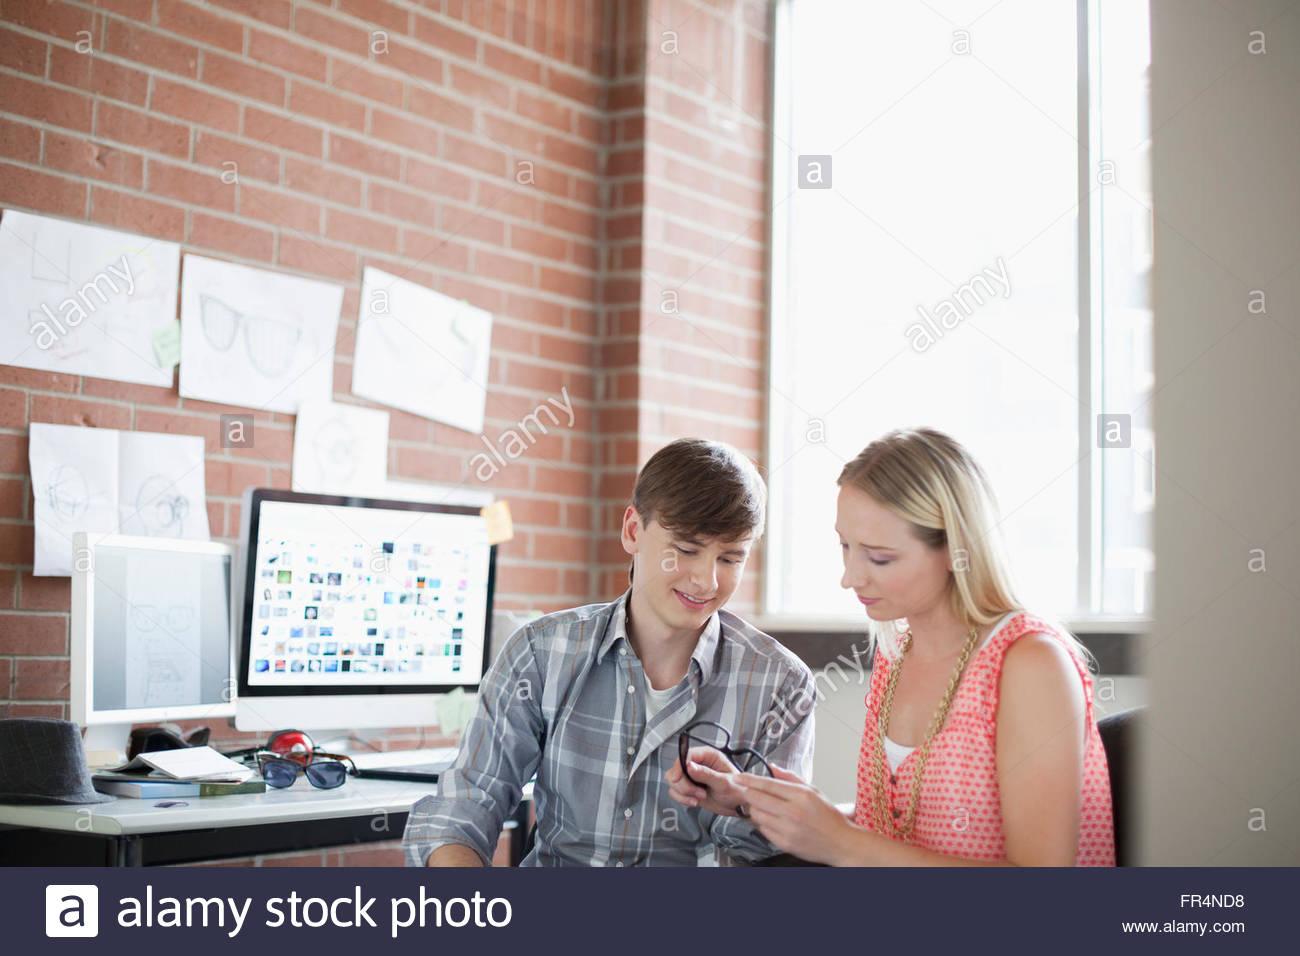 Os jovens adultos, colegas de projetar juntos Imagens de Stock